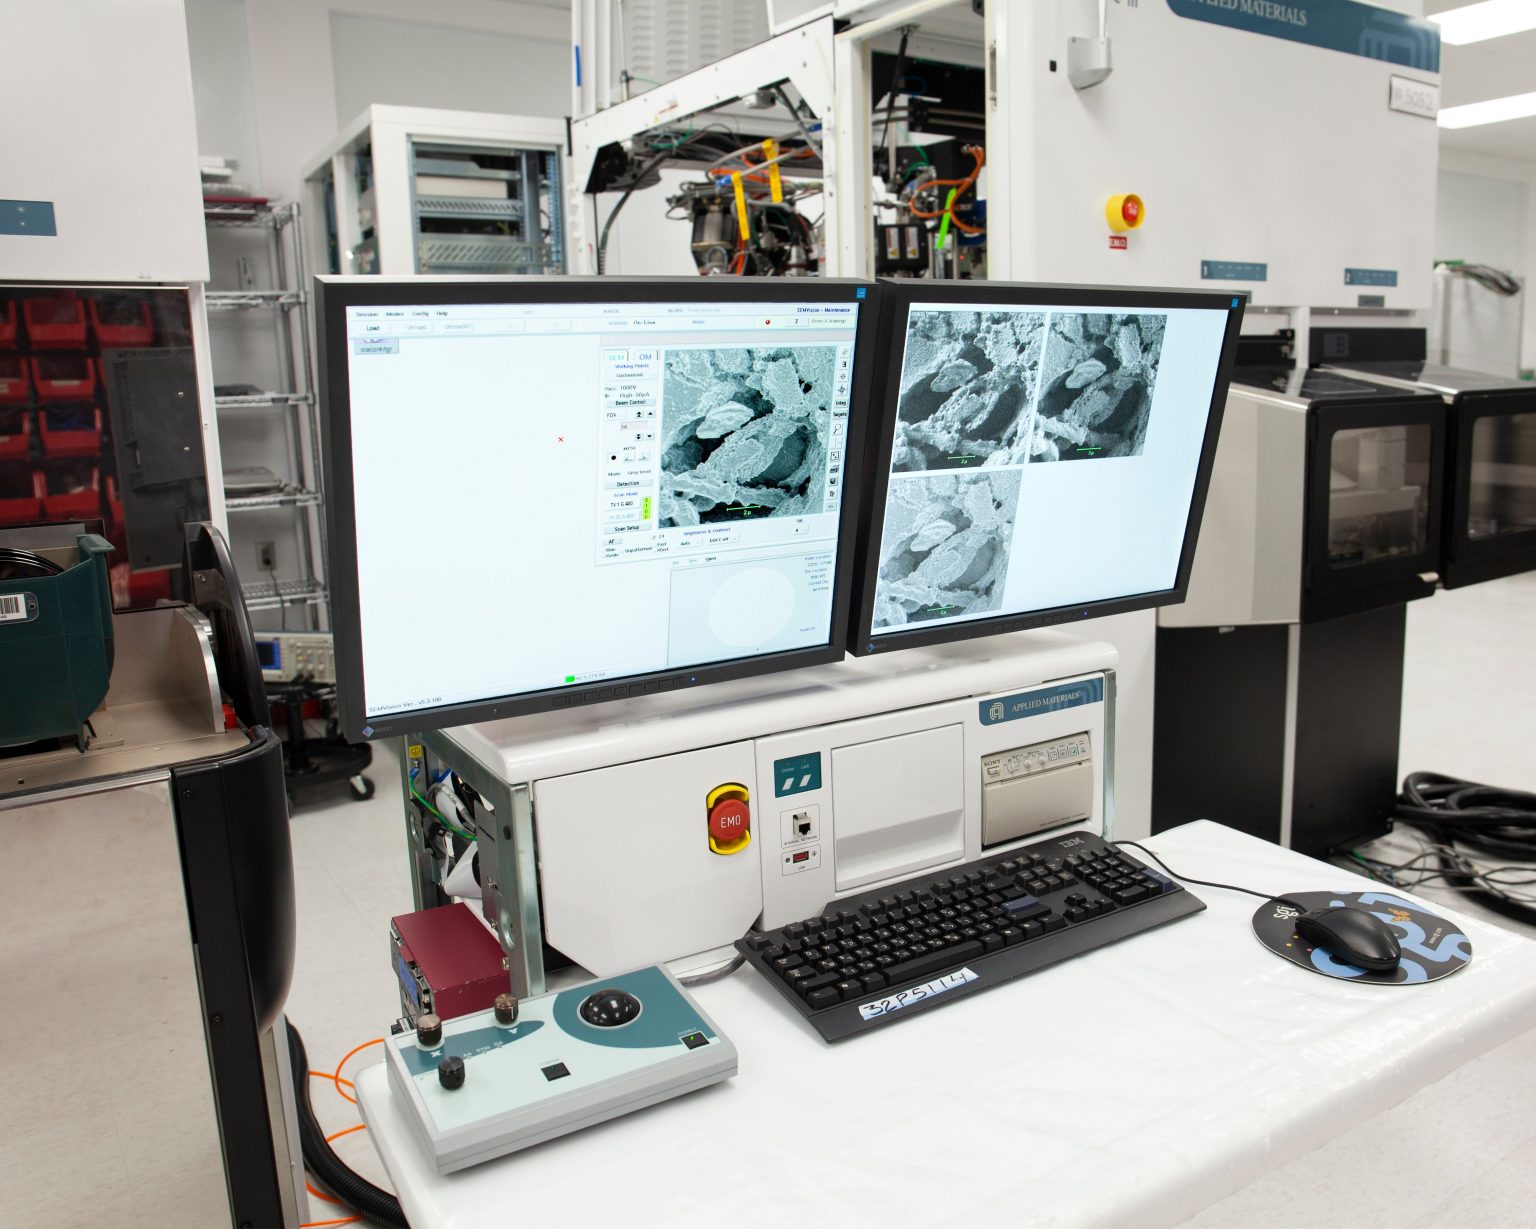 SEMVision G3 Workstation